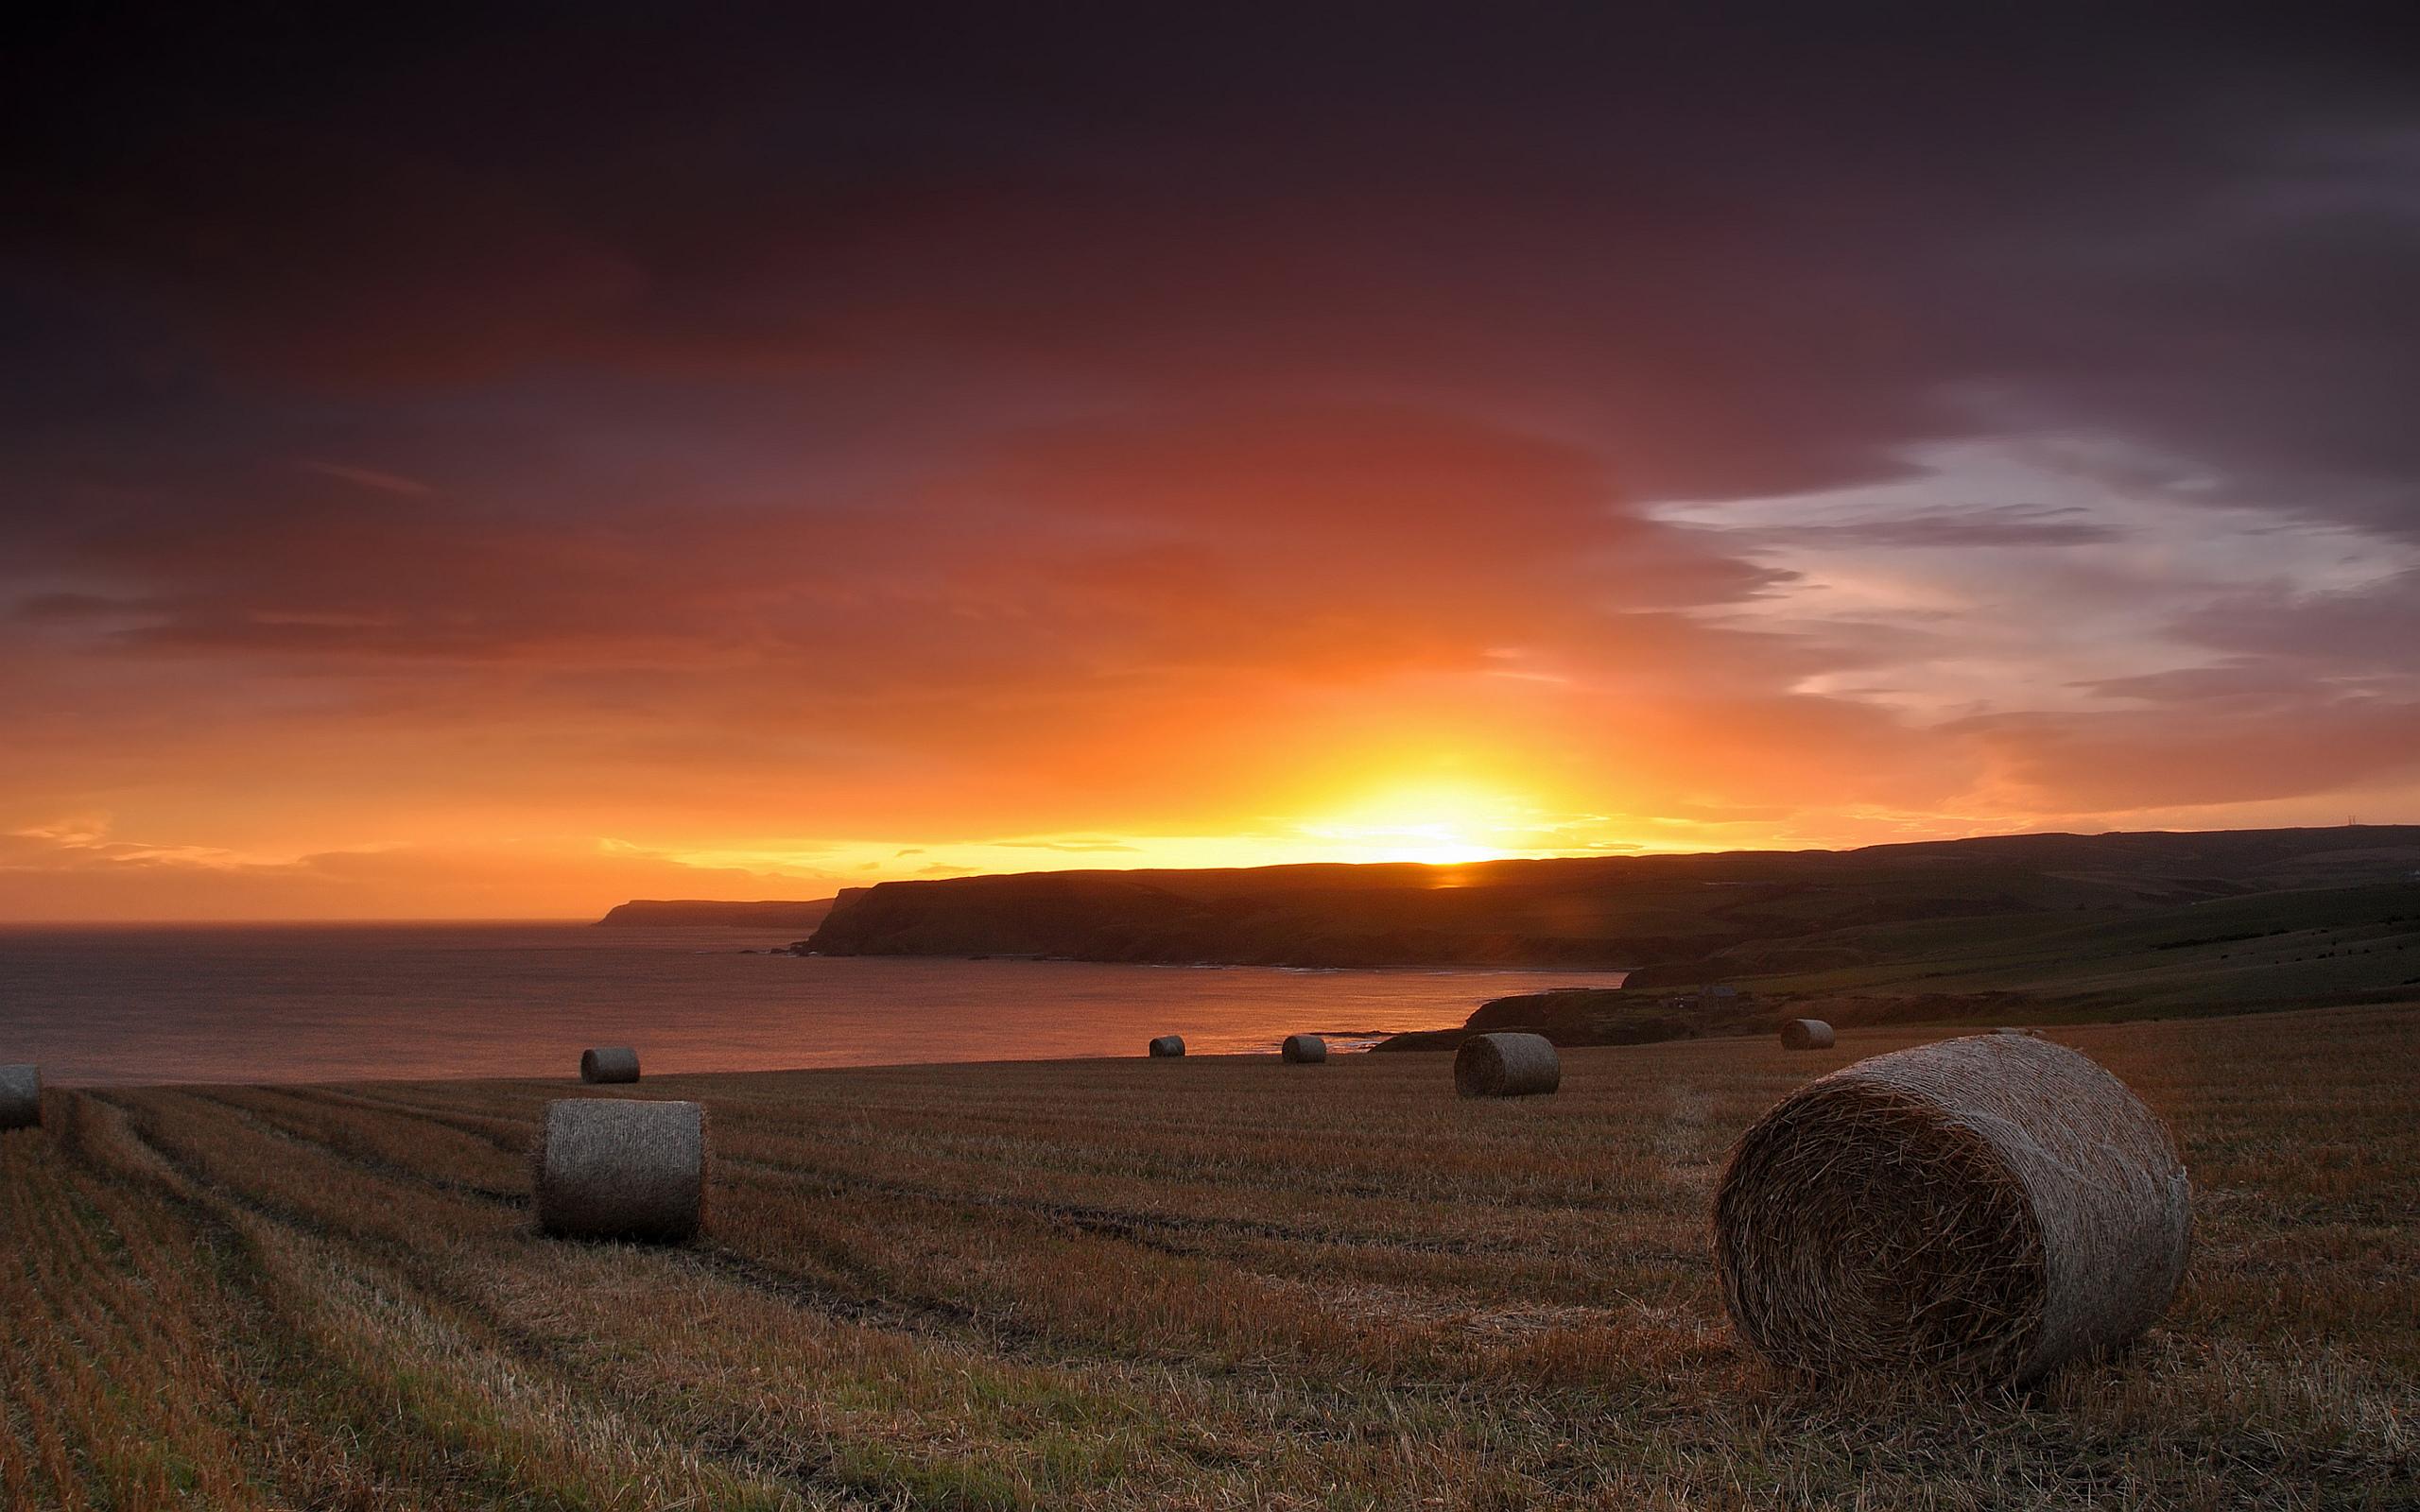 cornfield sunset lanscape